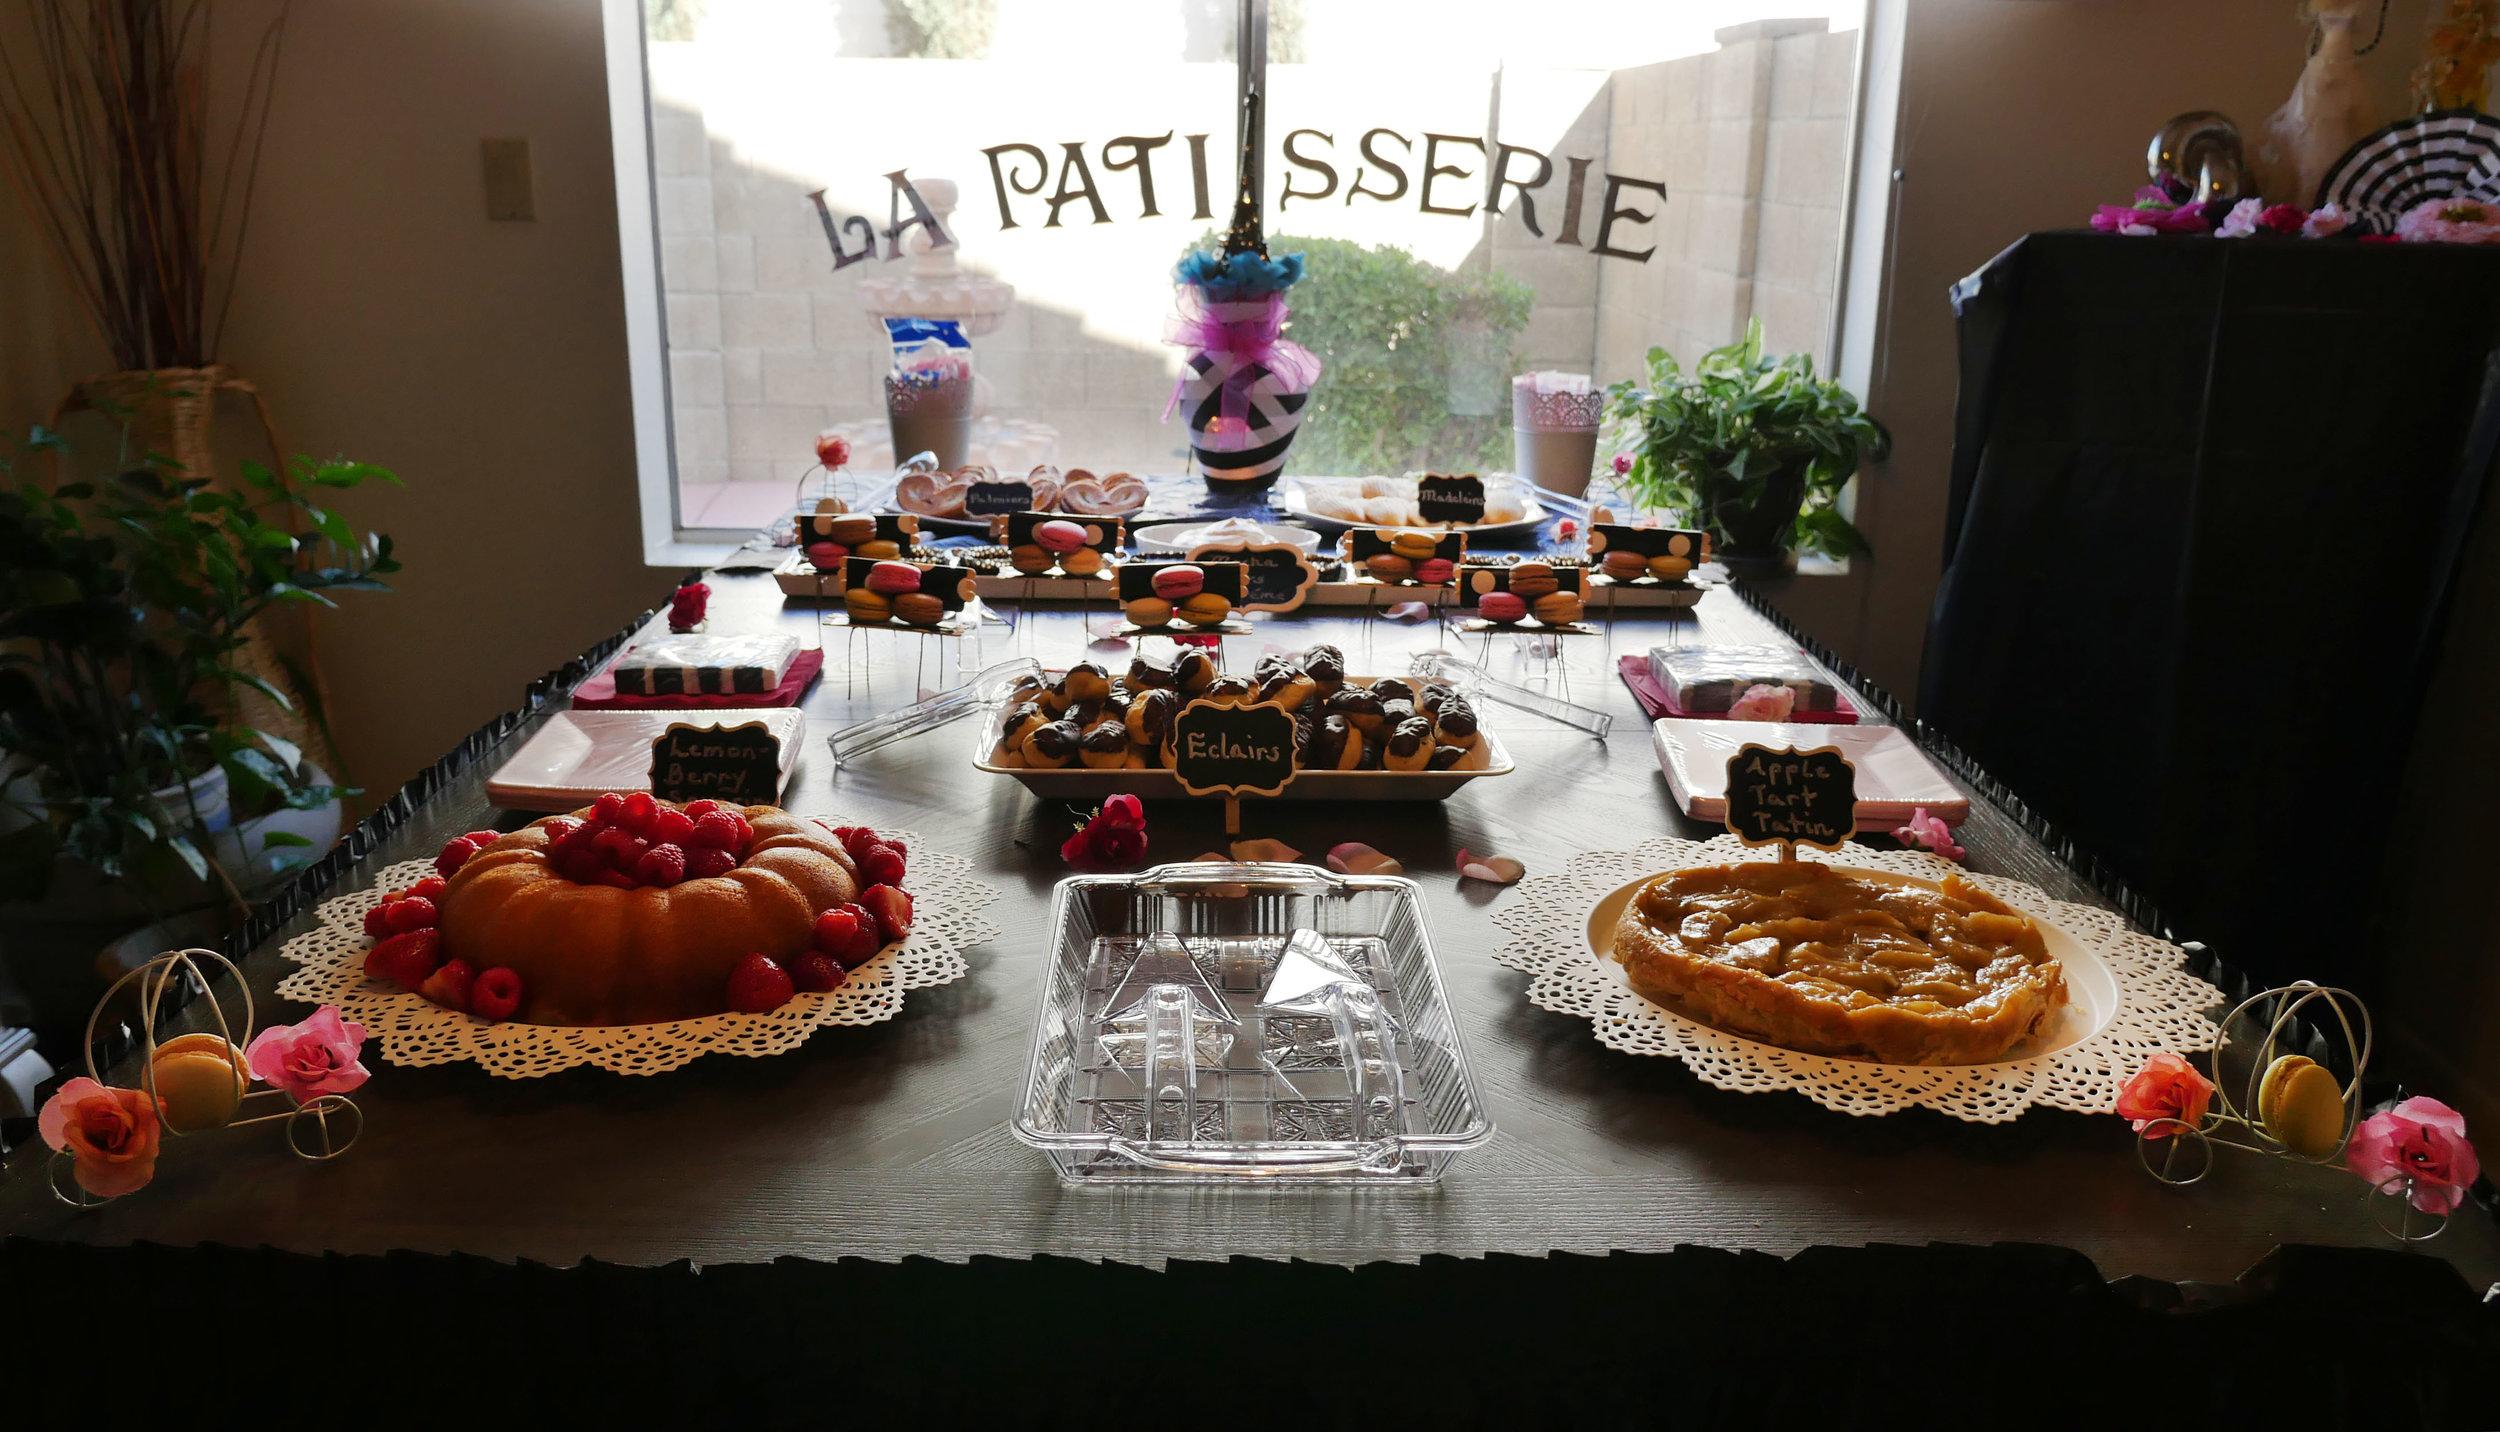 Analise 2nd Birthday Decor - Dessert Table 1.jpg